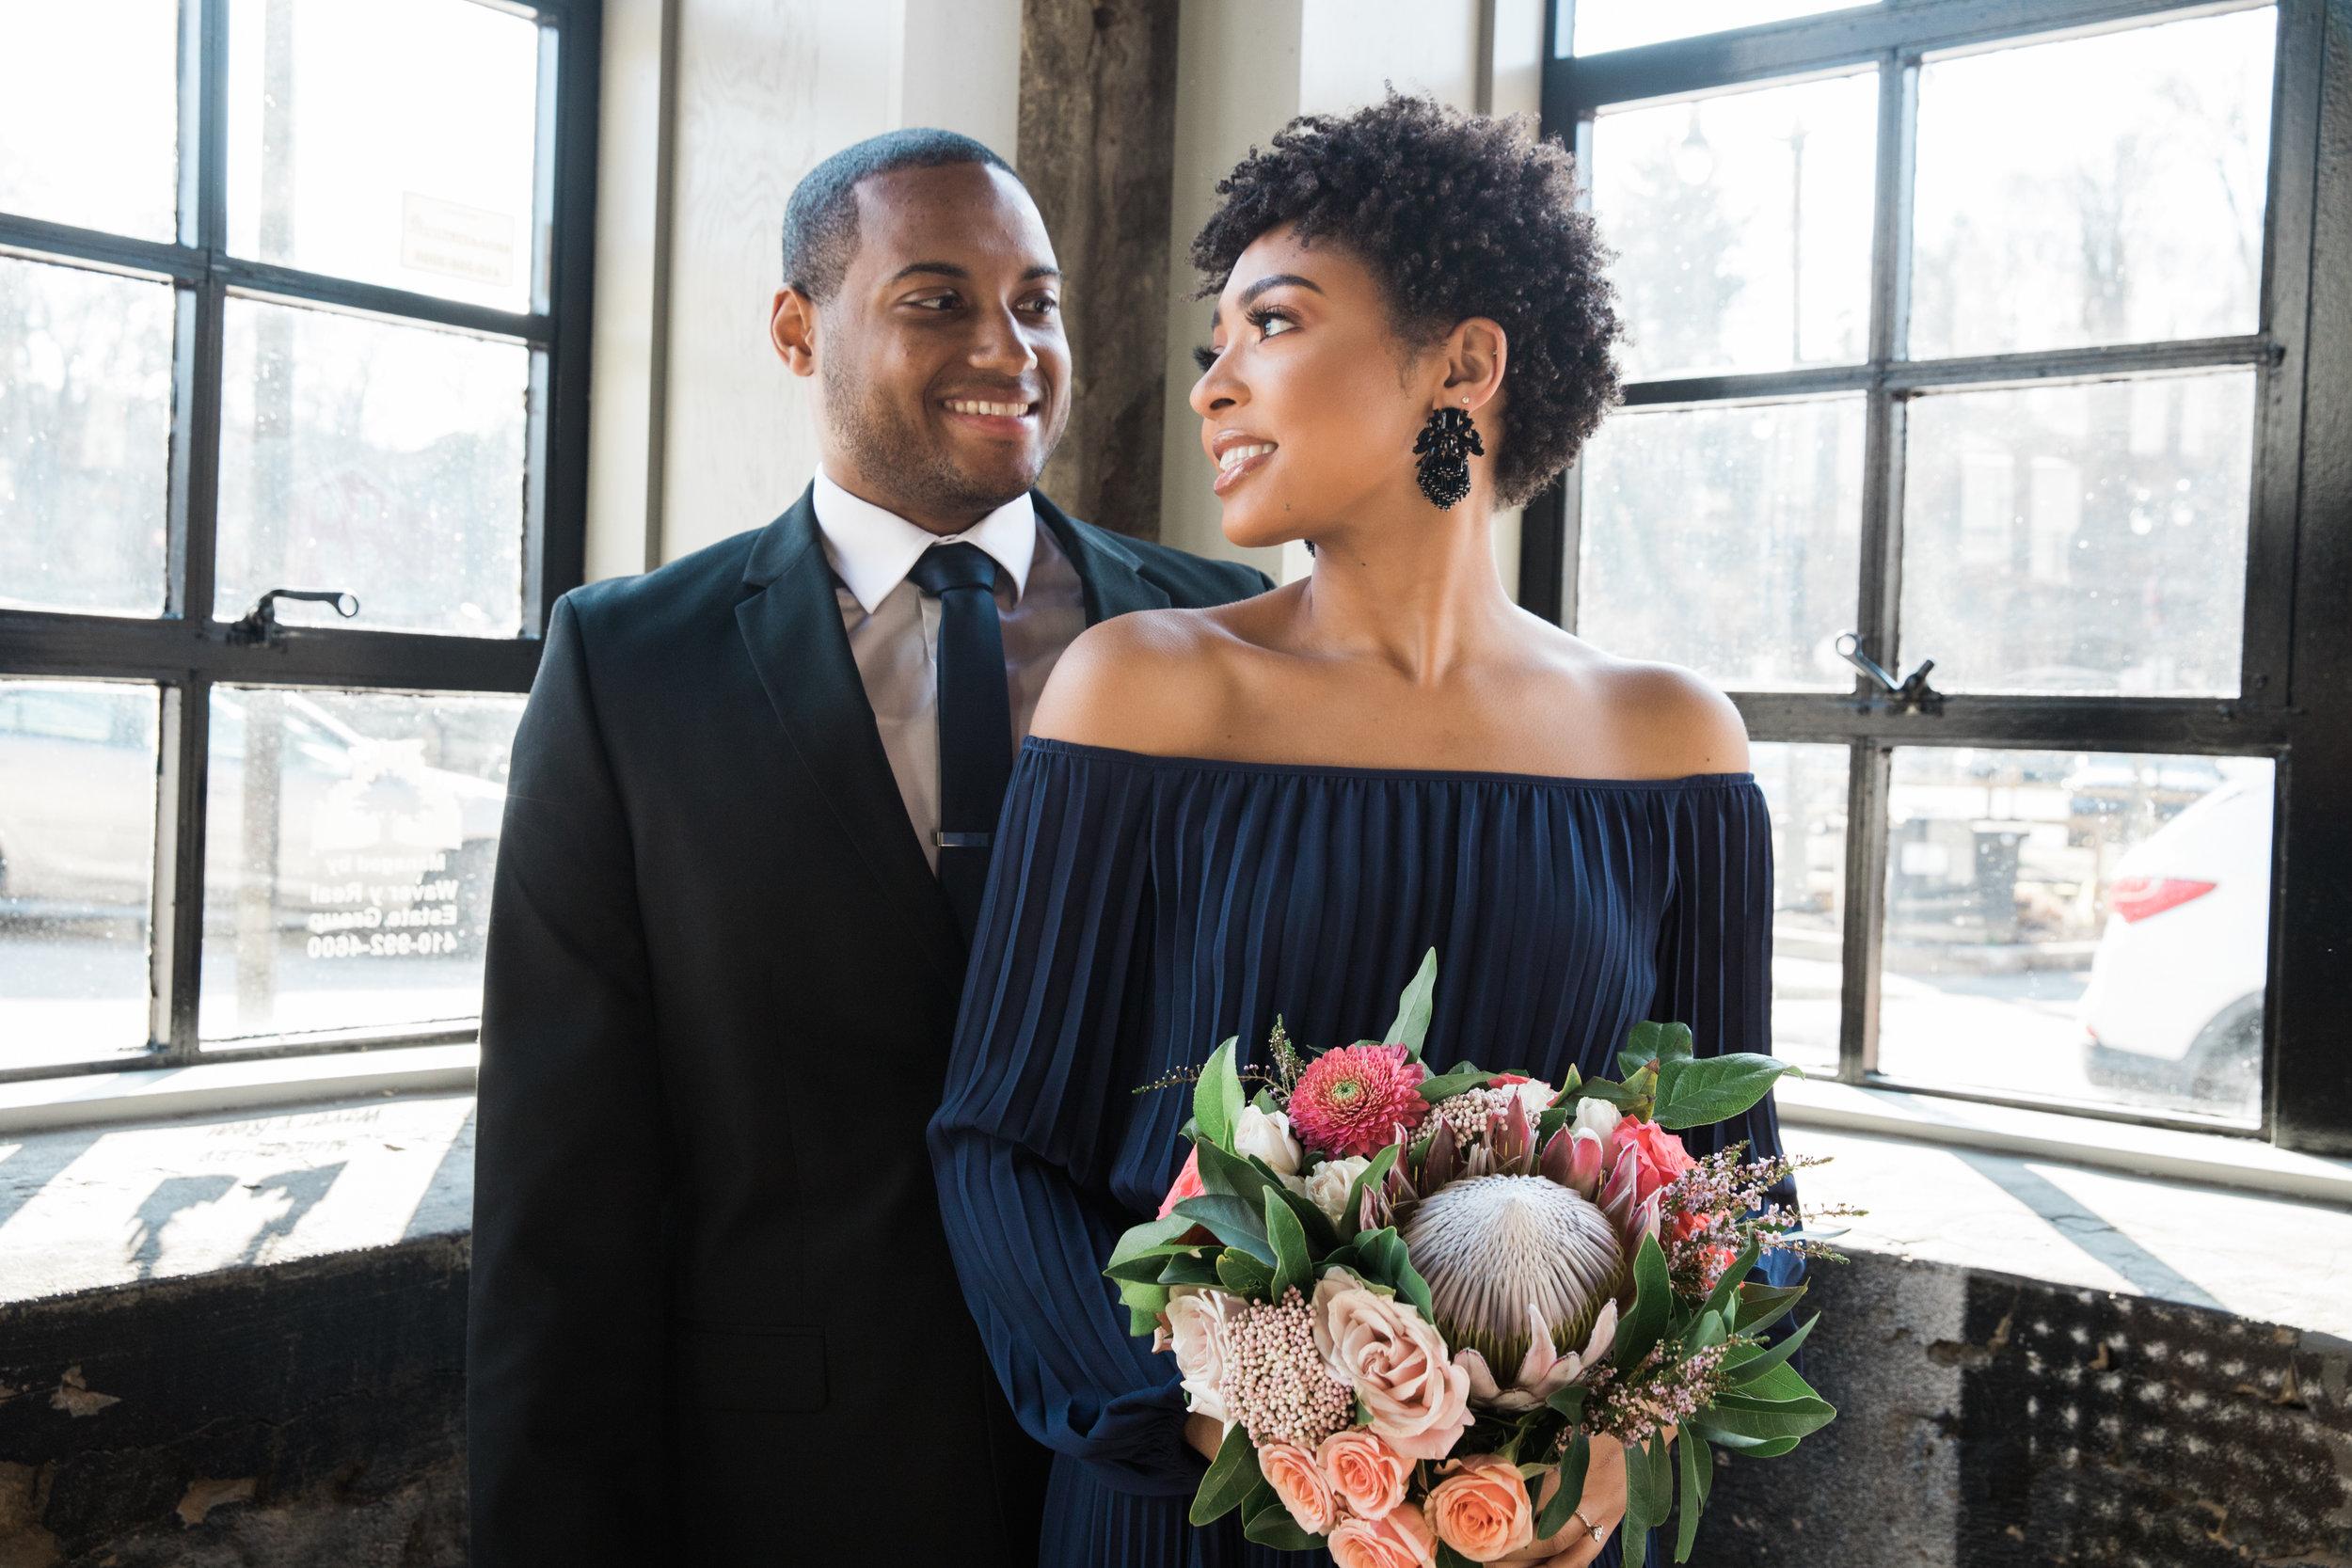 Natural Hair Black Bride in Baltimore Main Street Ballroom Engagement Session by Megapixels Media Photography-14.jpg